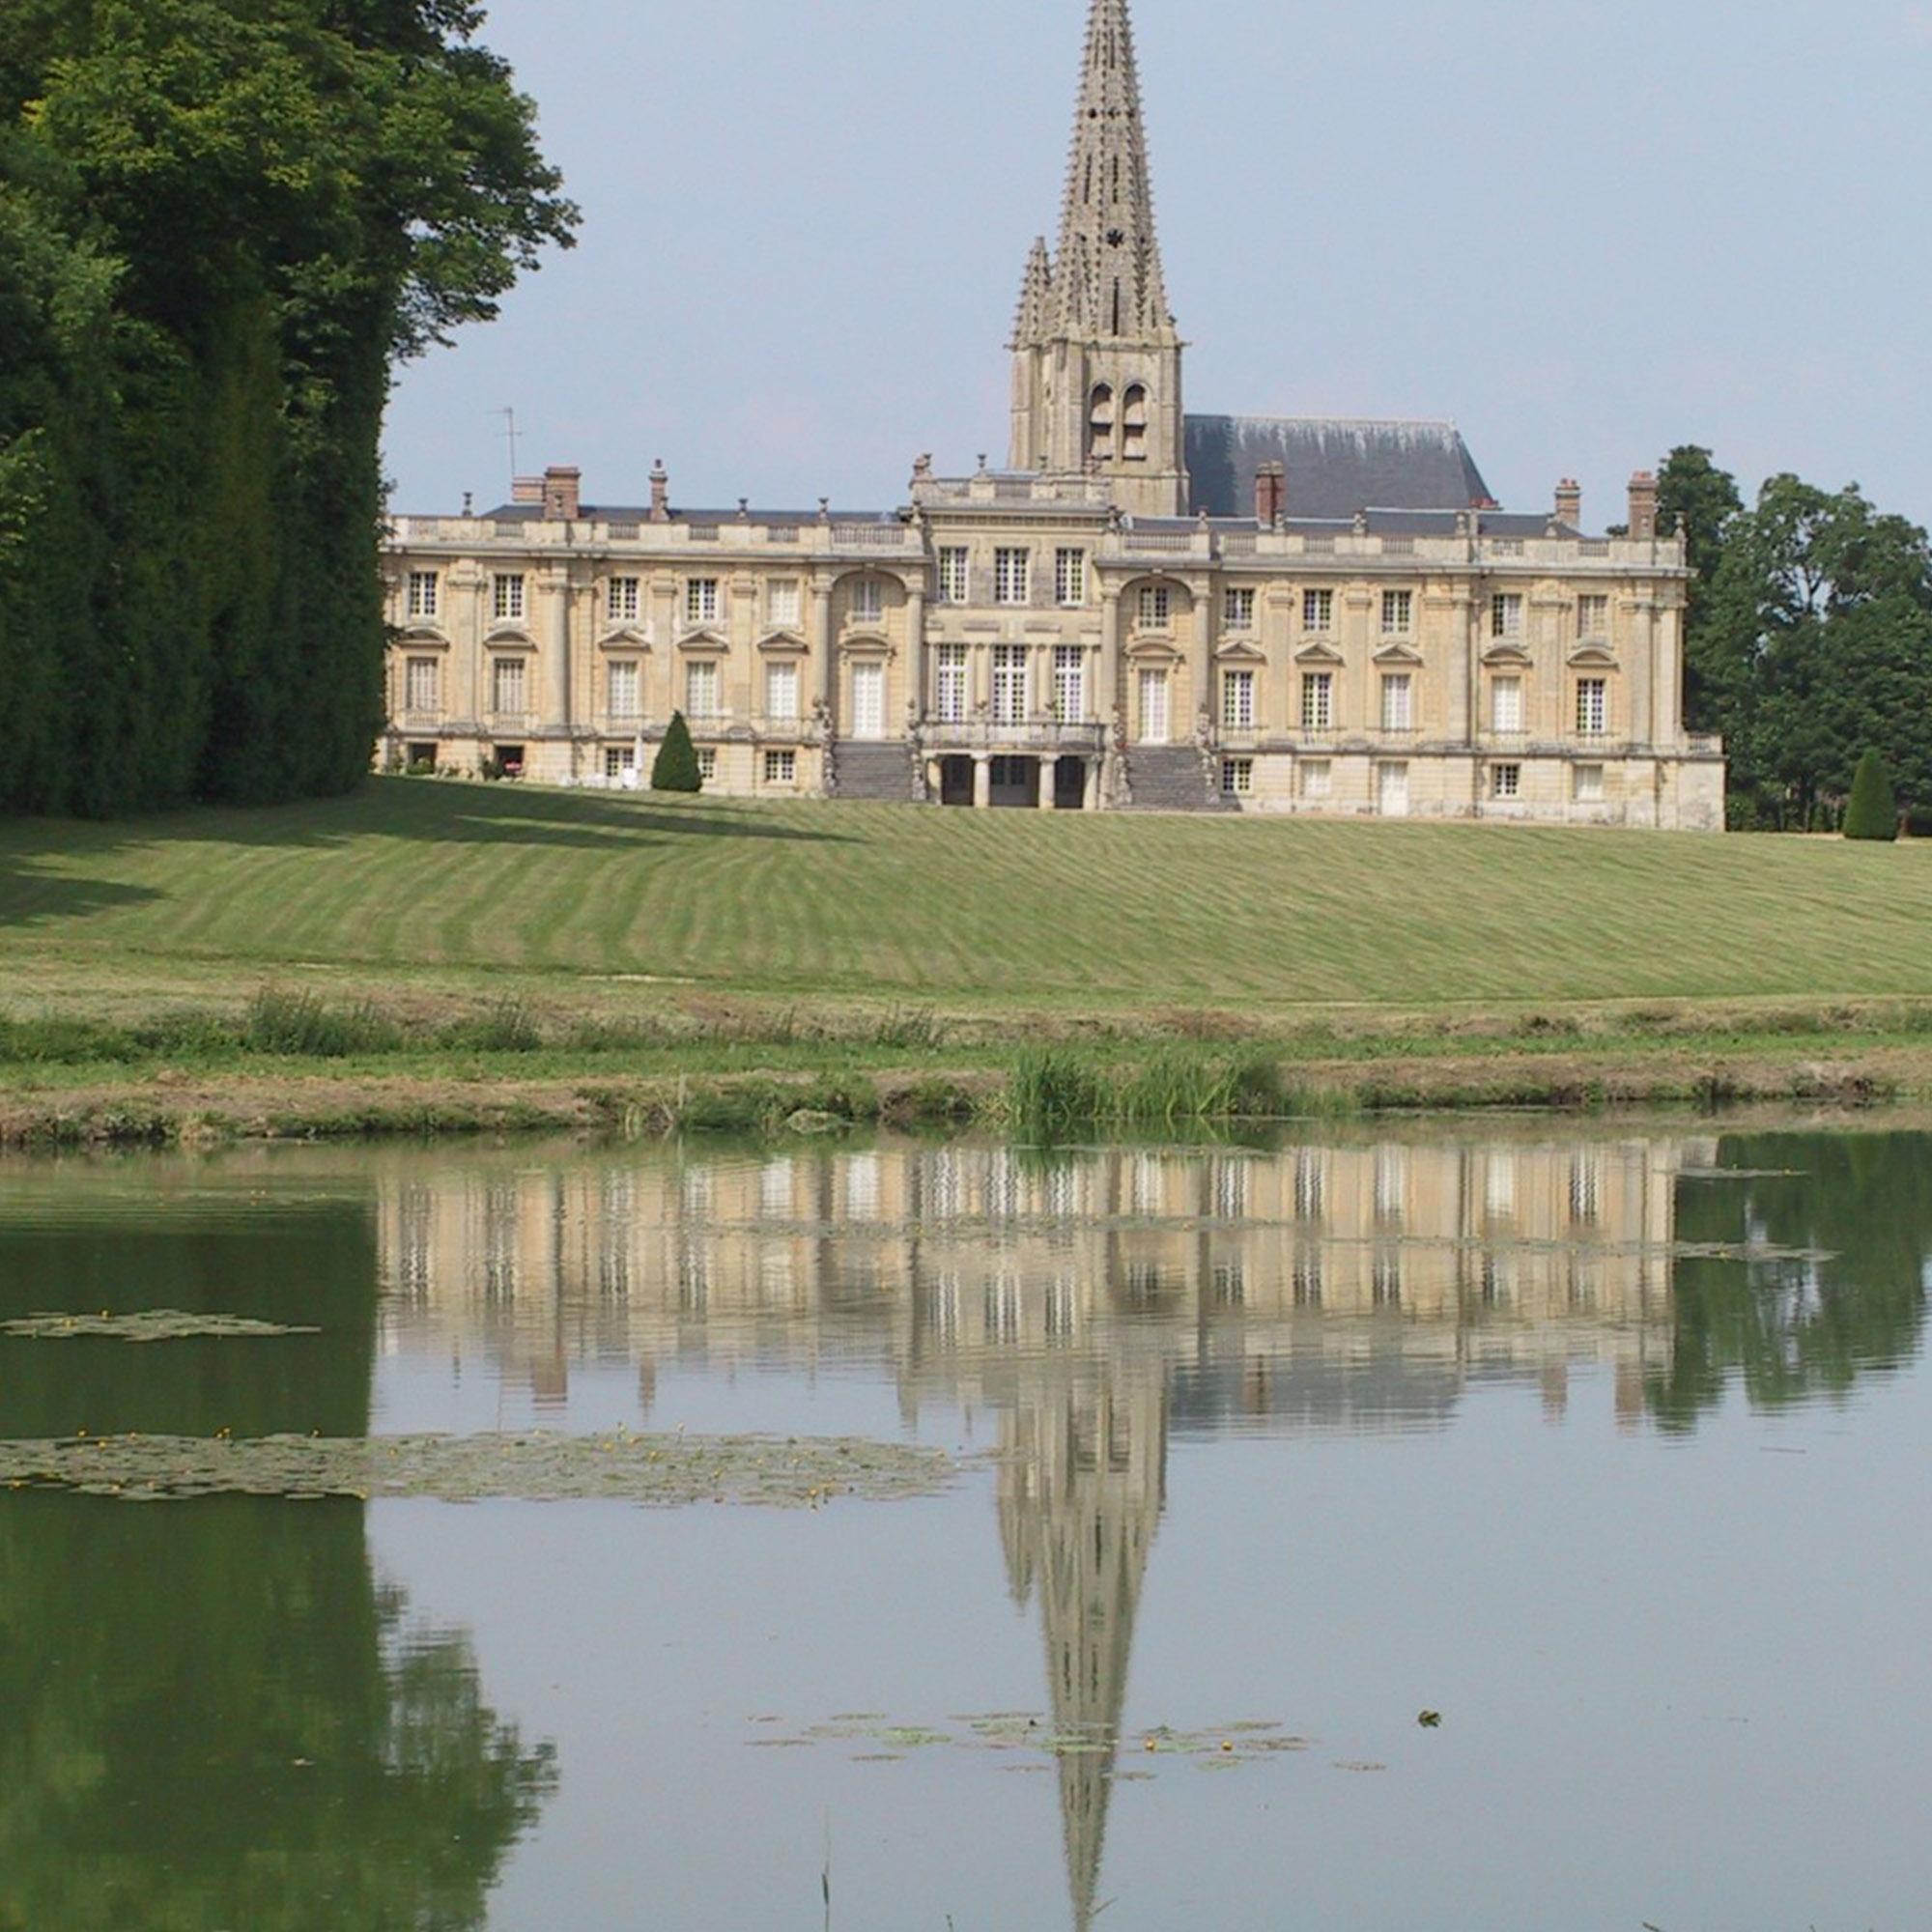 chateau_de_Versigny_gîte_saint_germain_oise_versigny_2